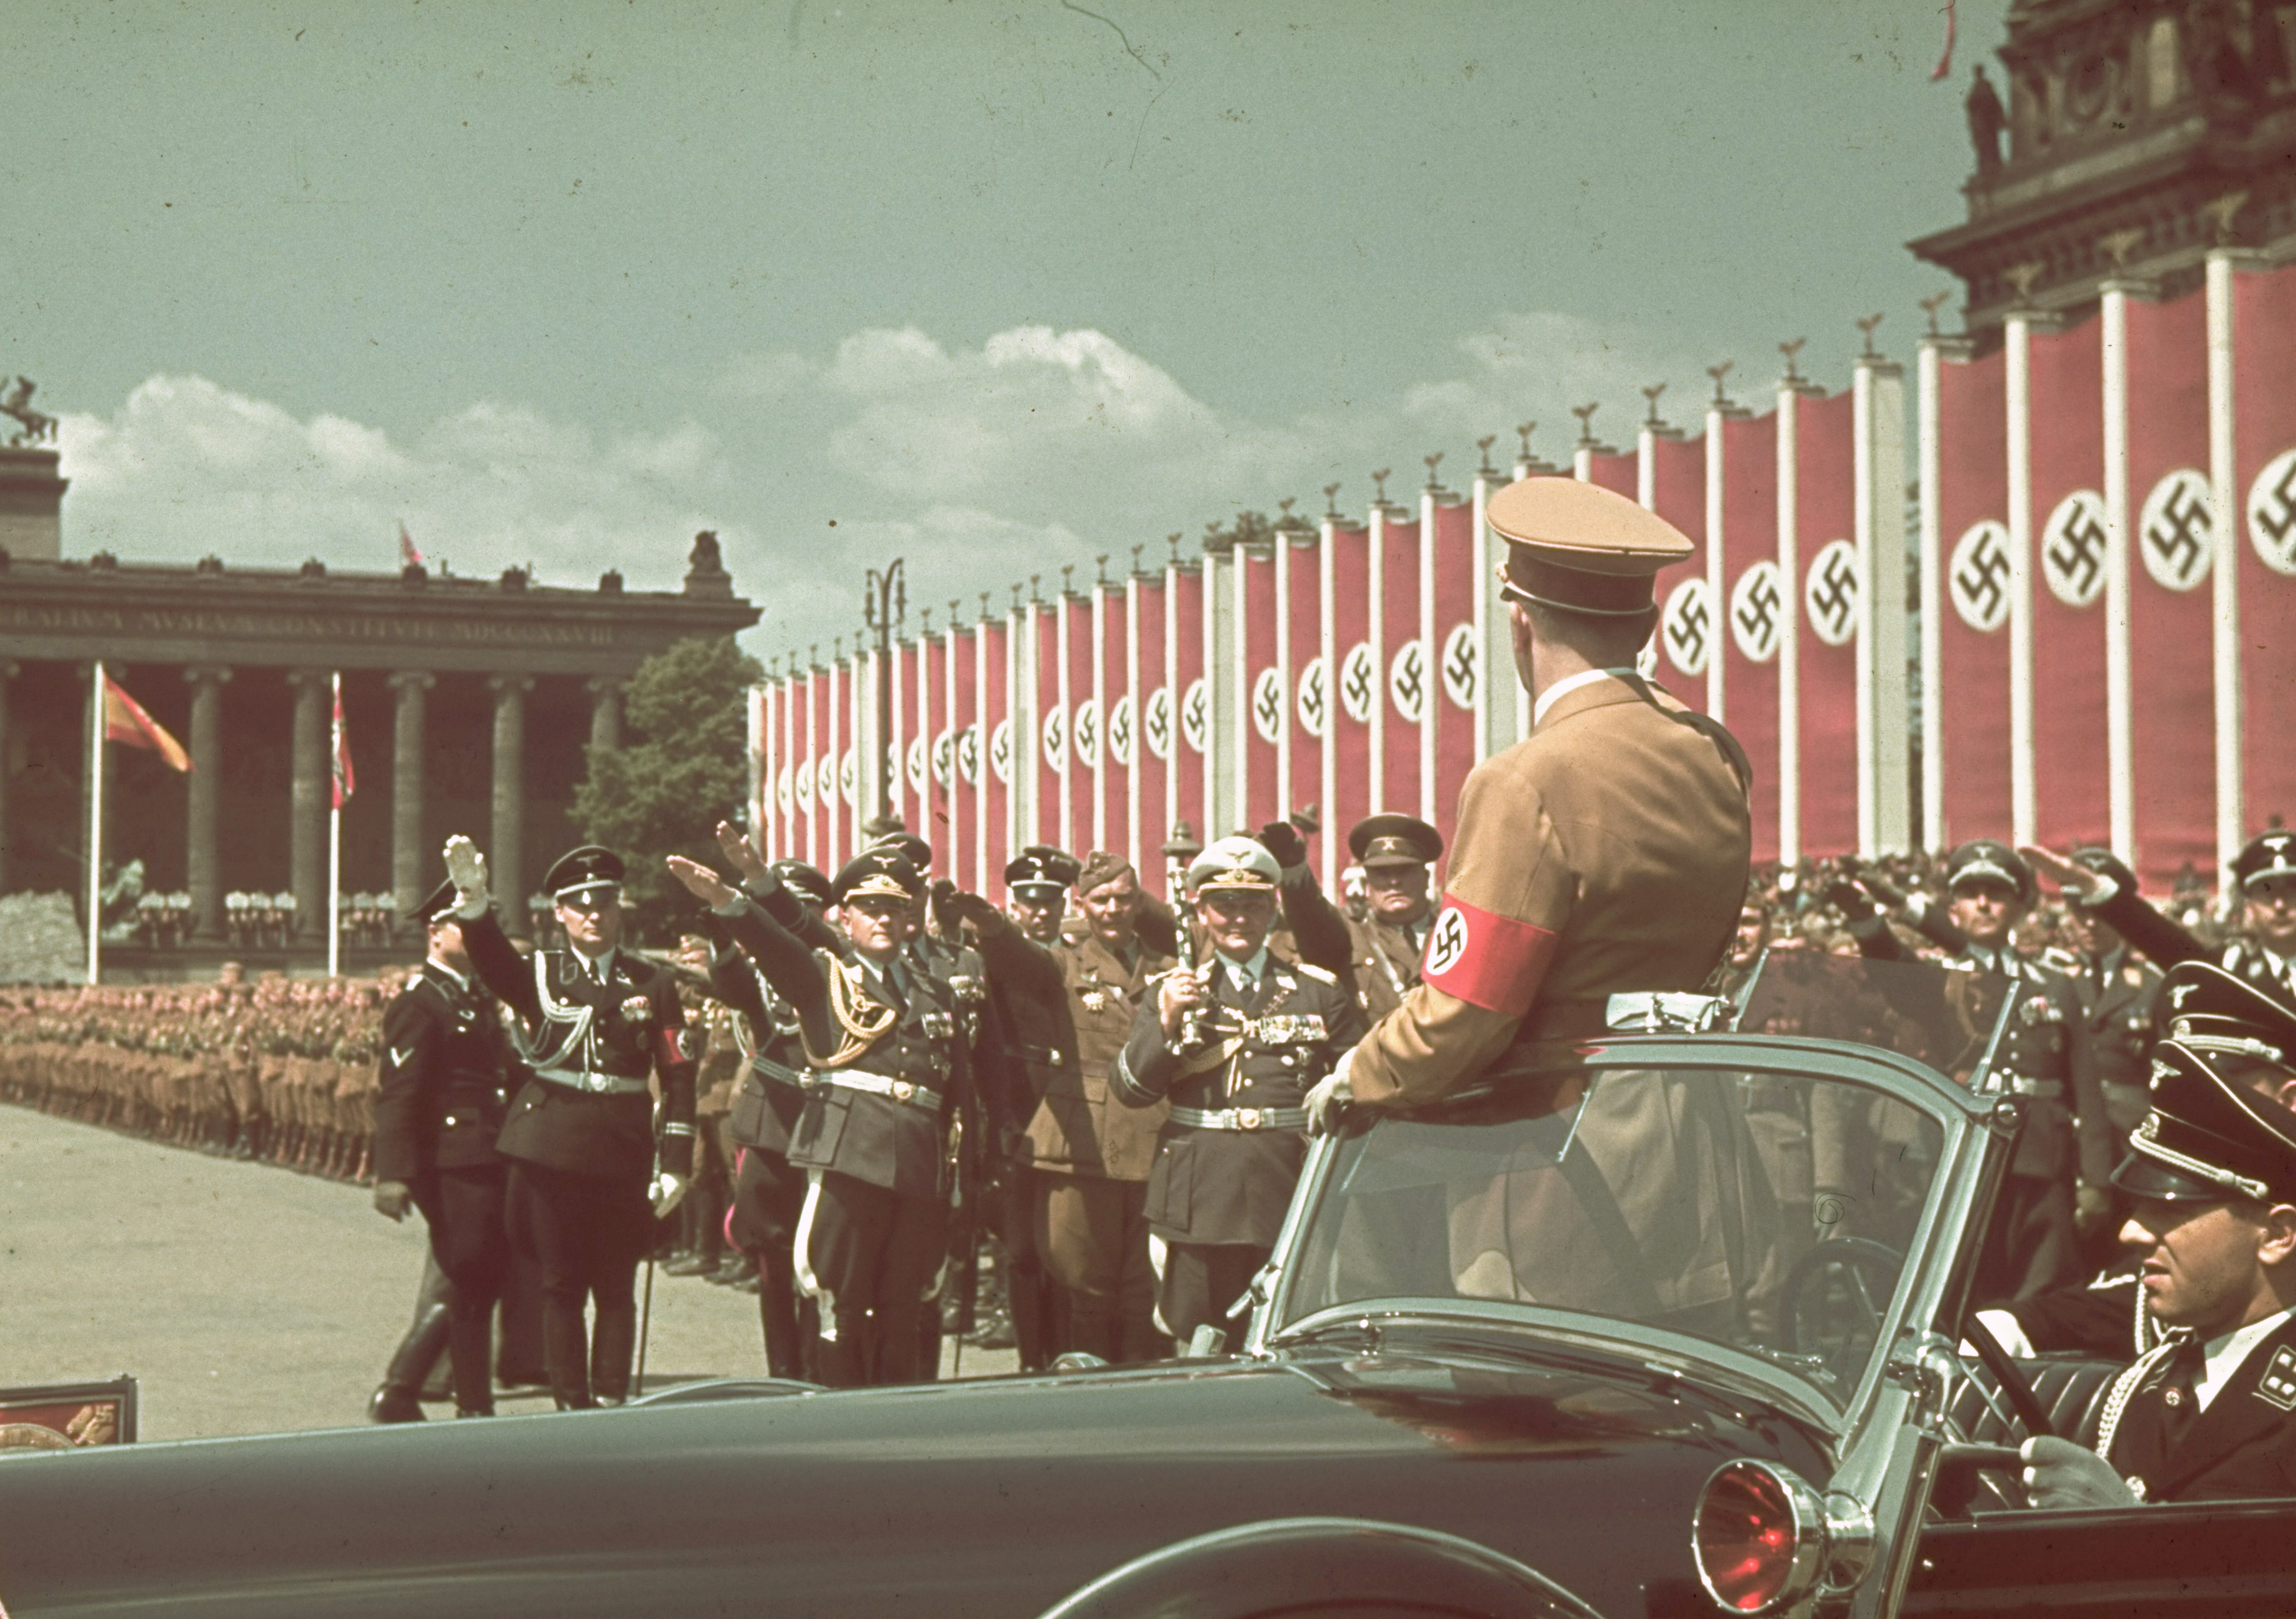 Inside the Drug Use That Fueled Nazi Germany - HISTORY